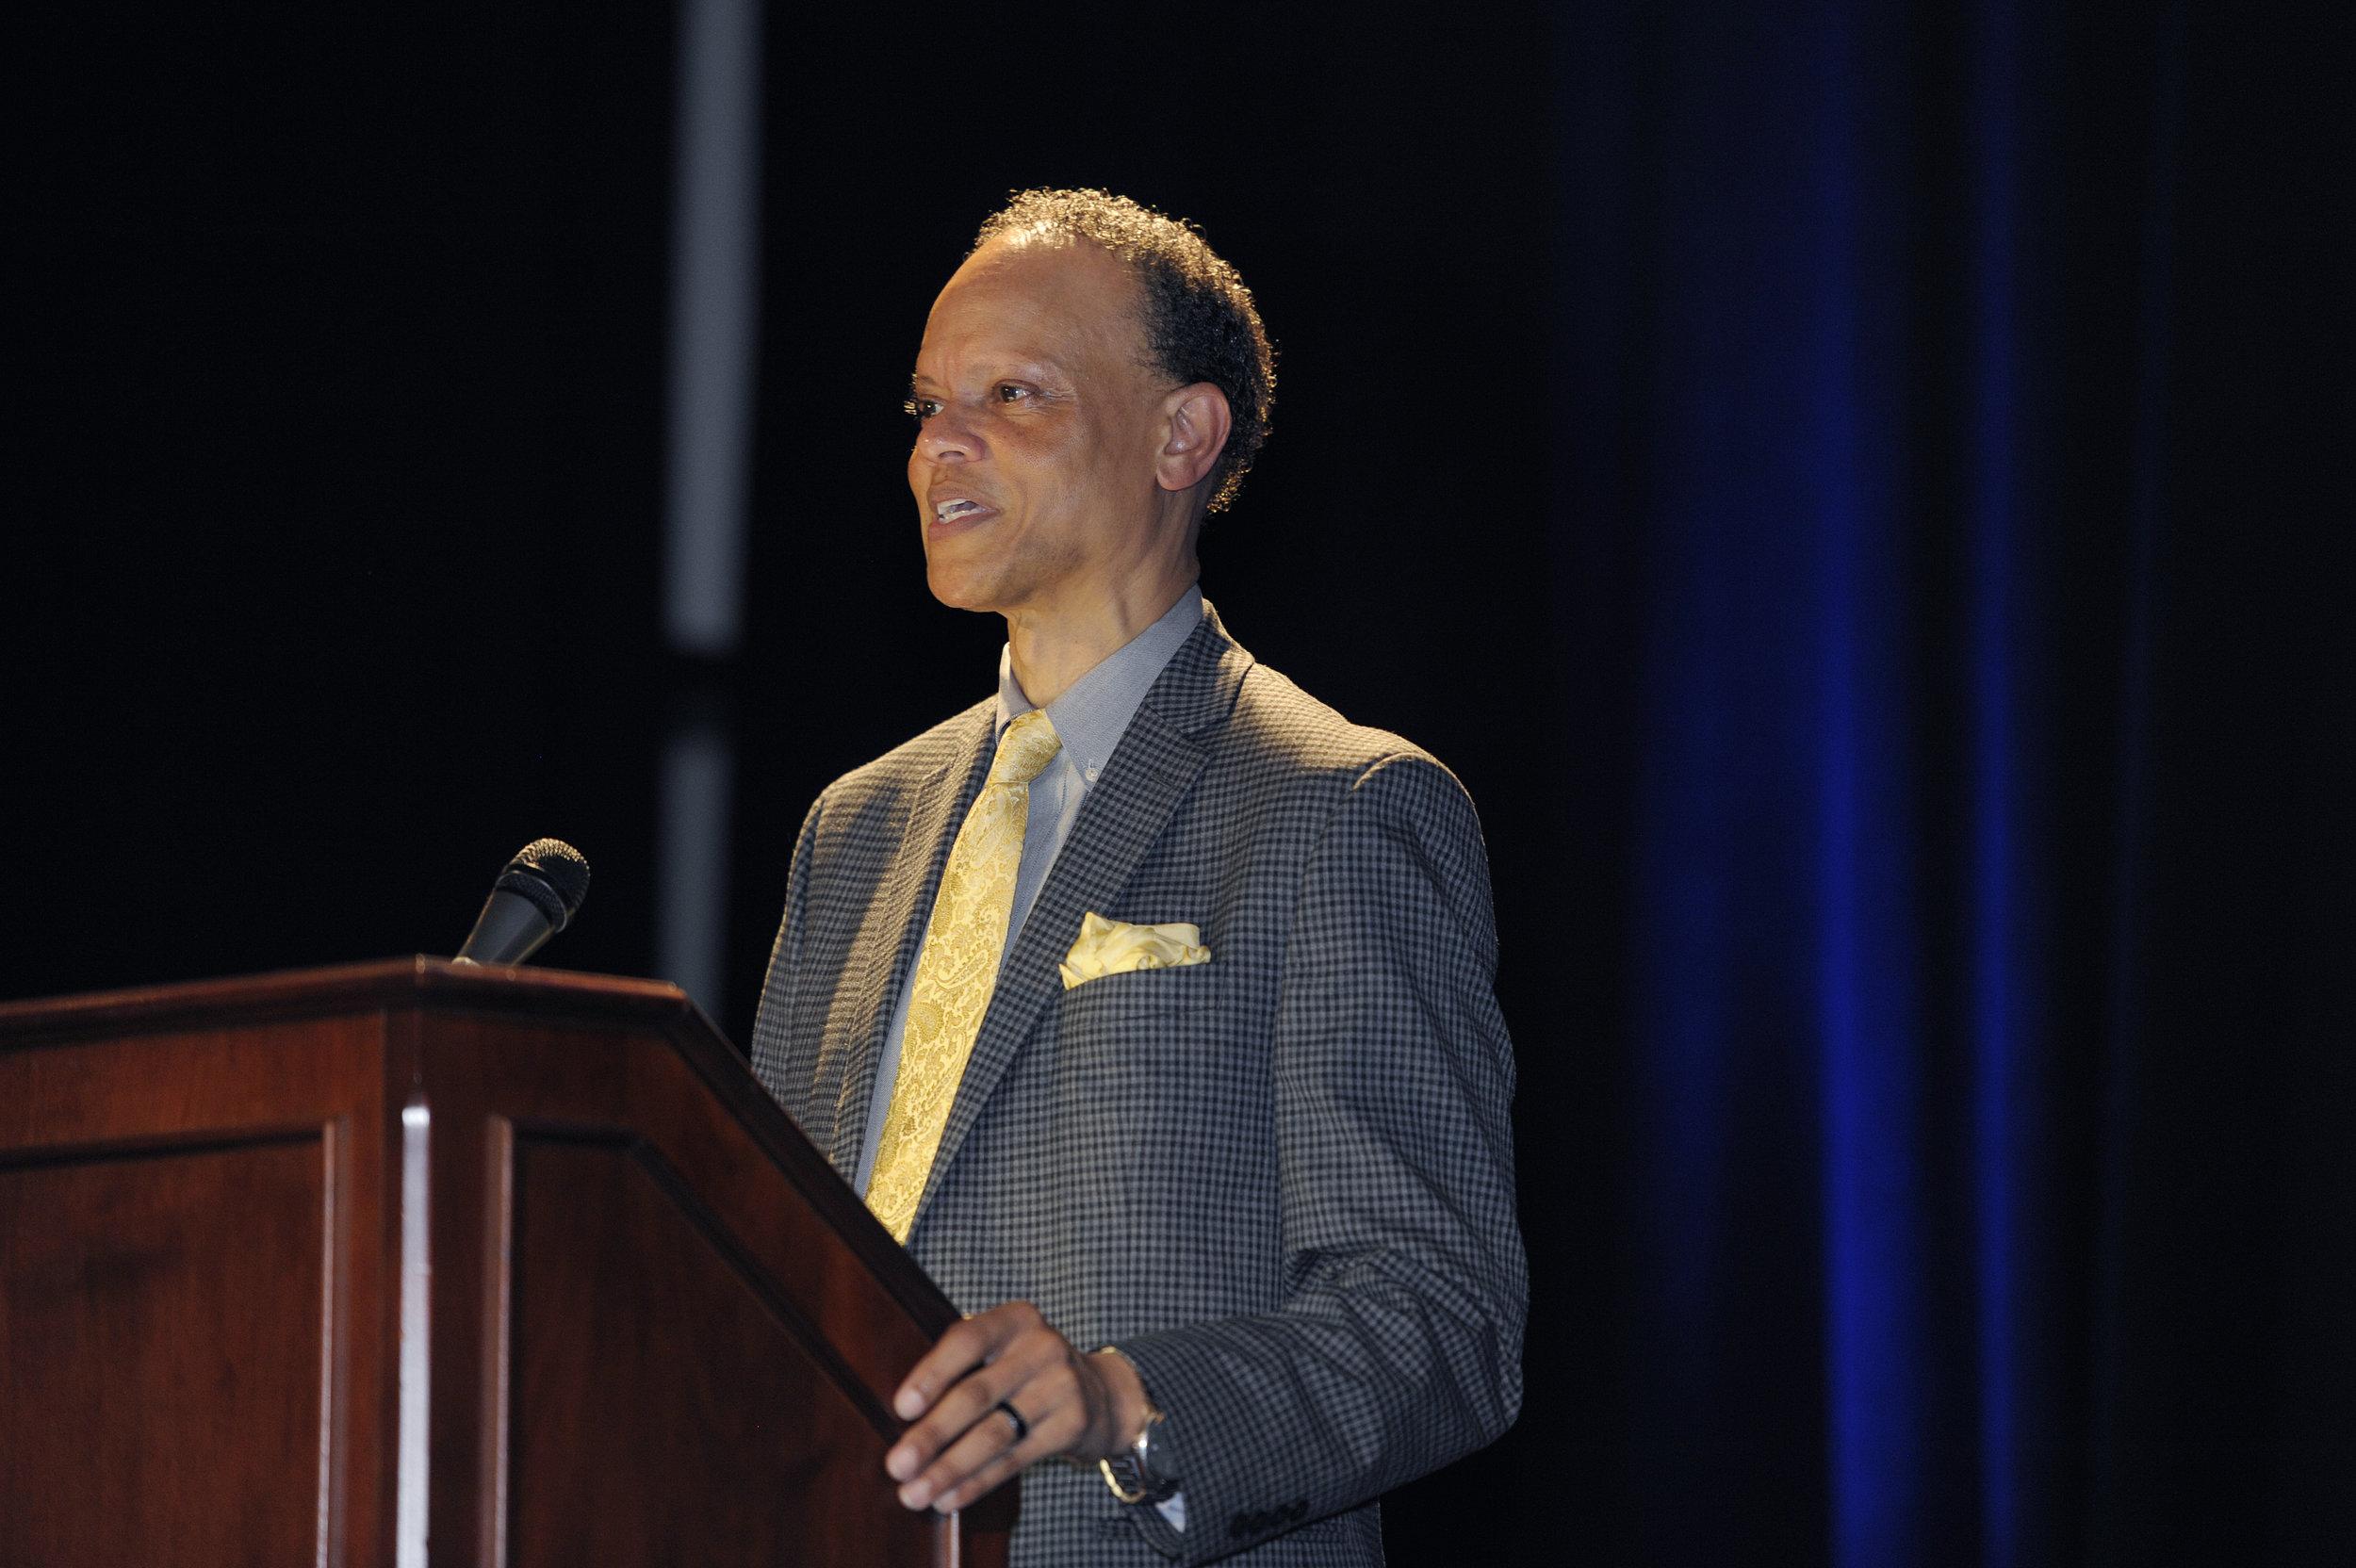 Hannibal B. Johnson, conference keynote speaker